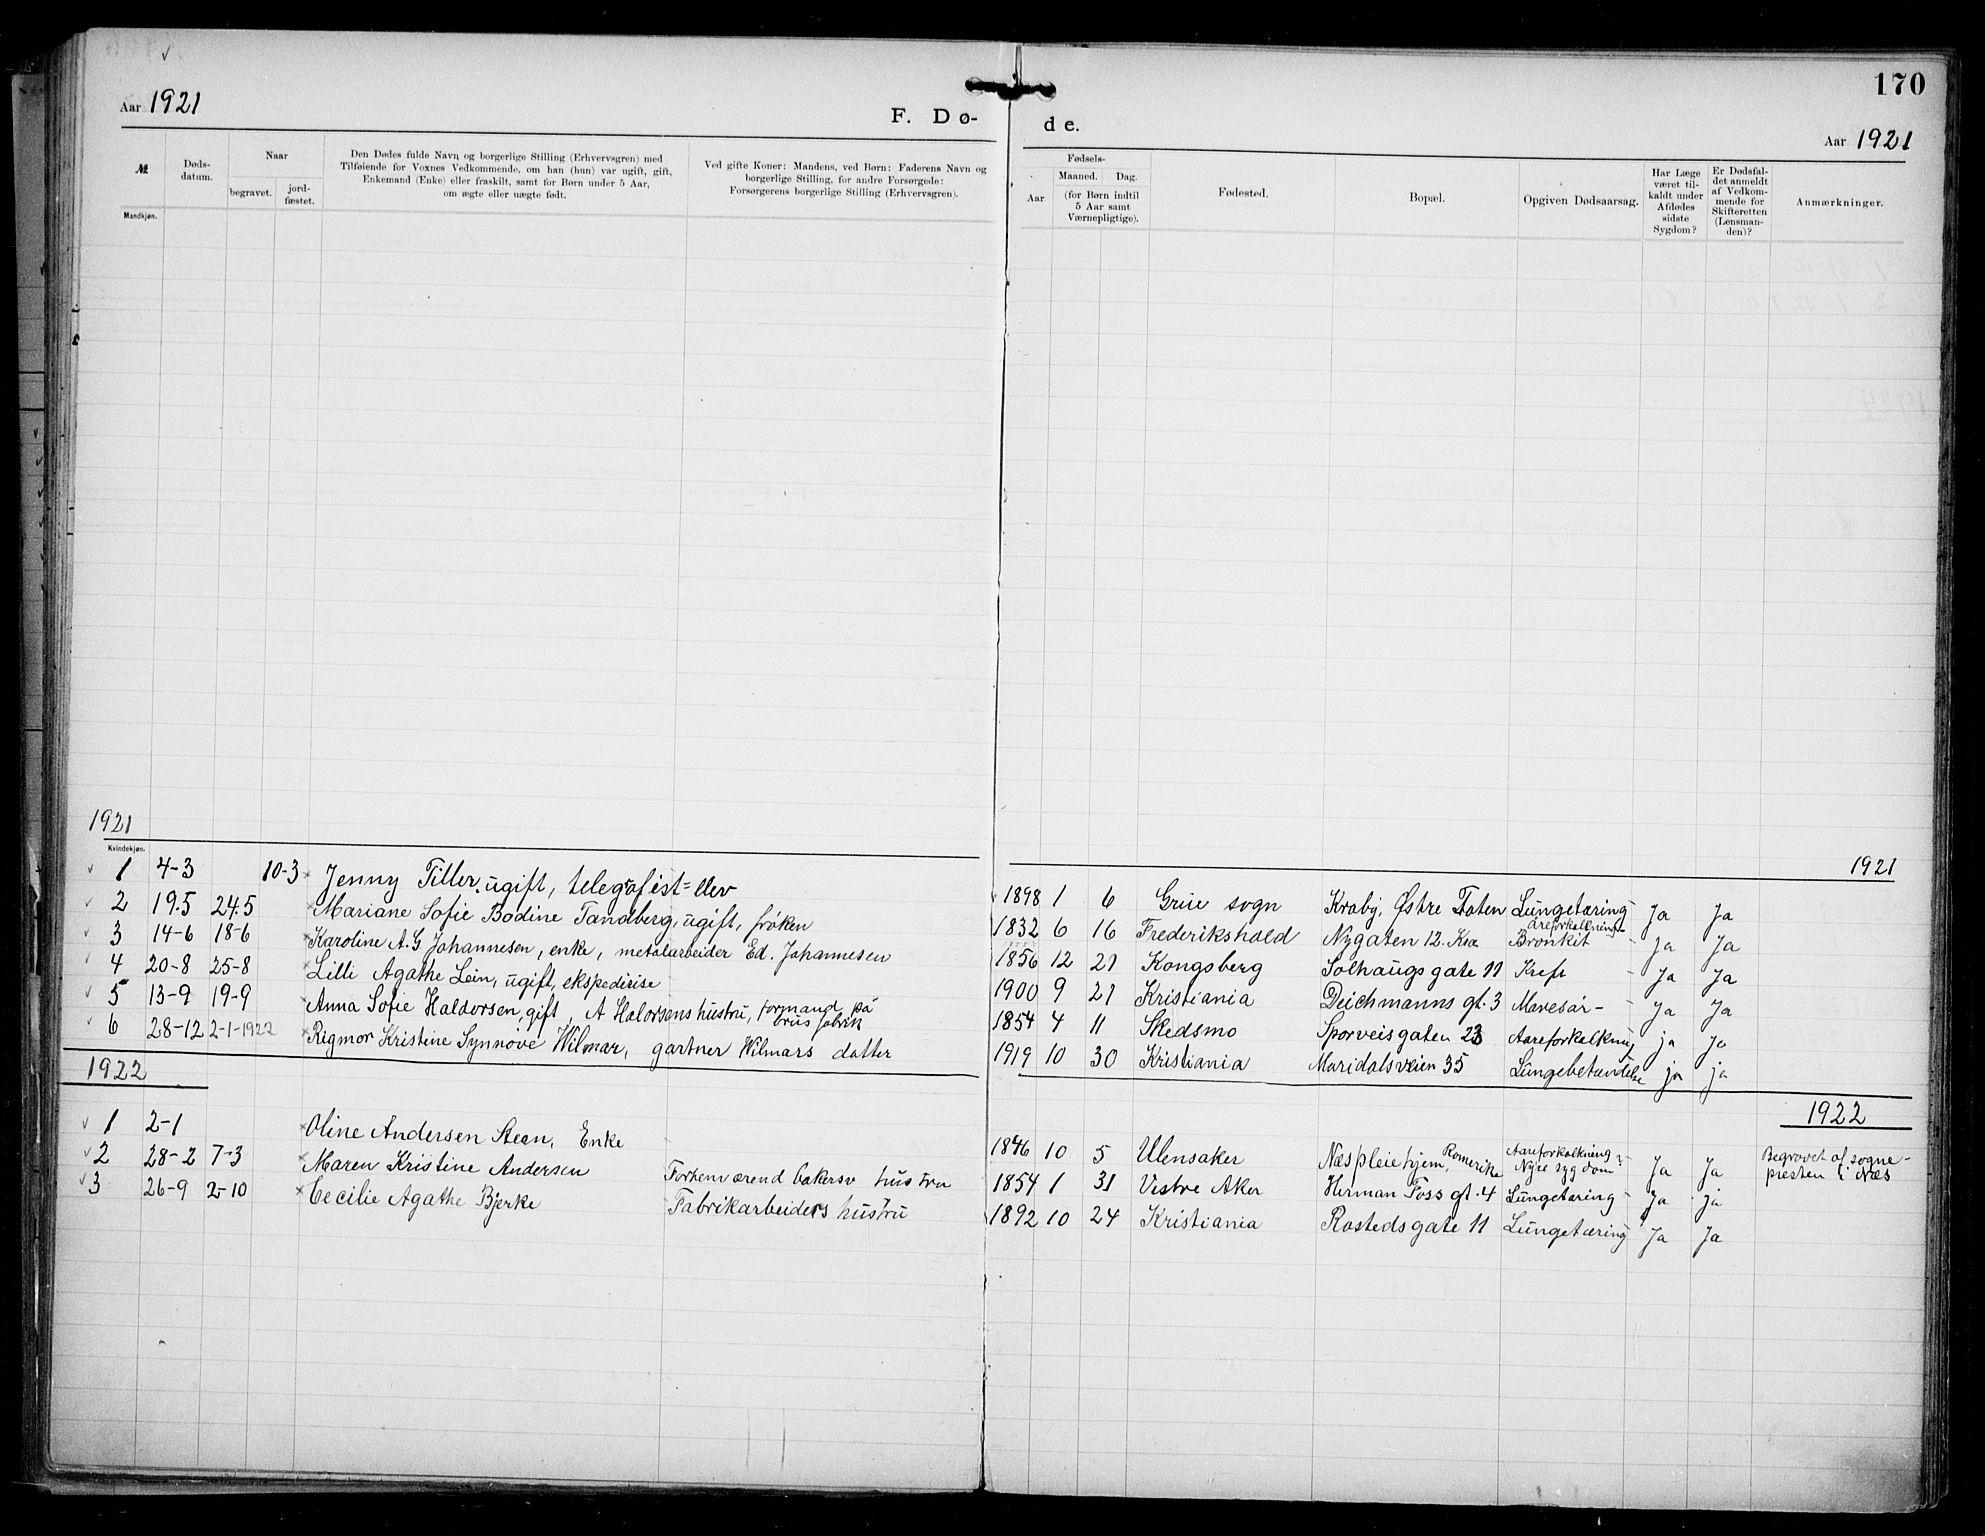 SAO, Den katolsk apostoliske menighet i Oslo , F/Fa/L0002: Dissenterprotokoll nr. 2, 1892-1937, s. 170